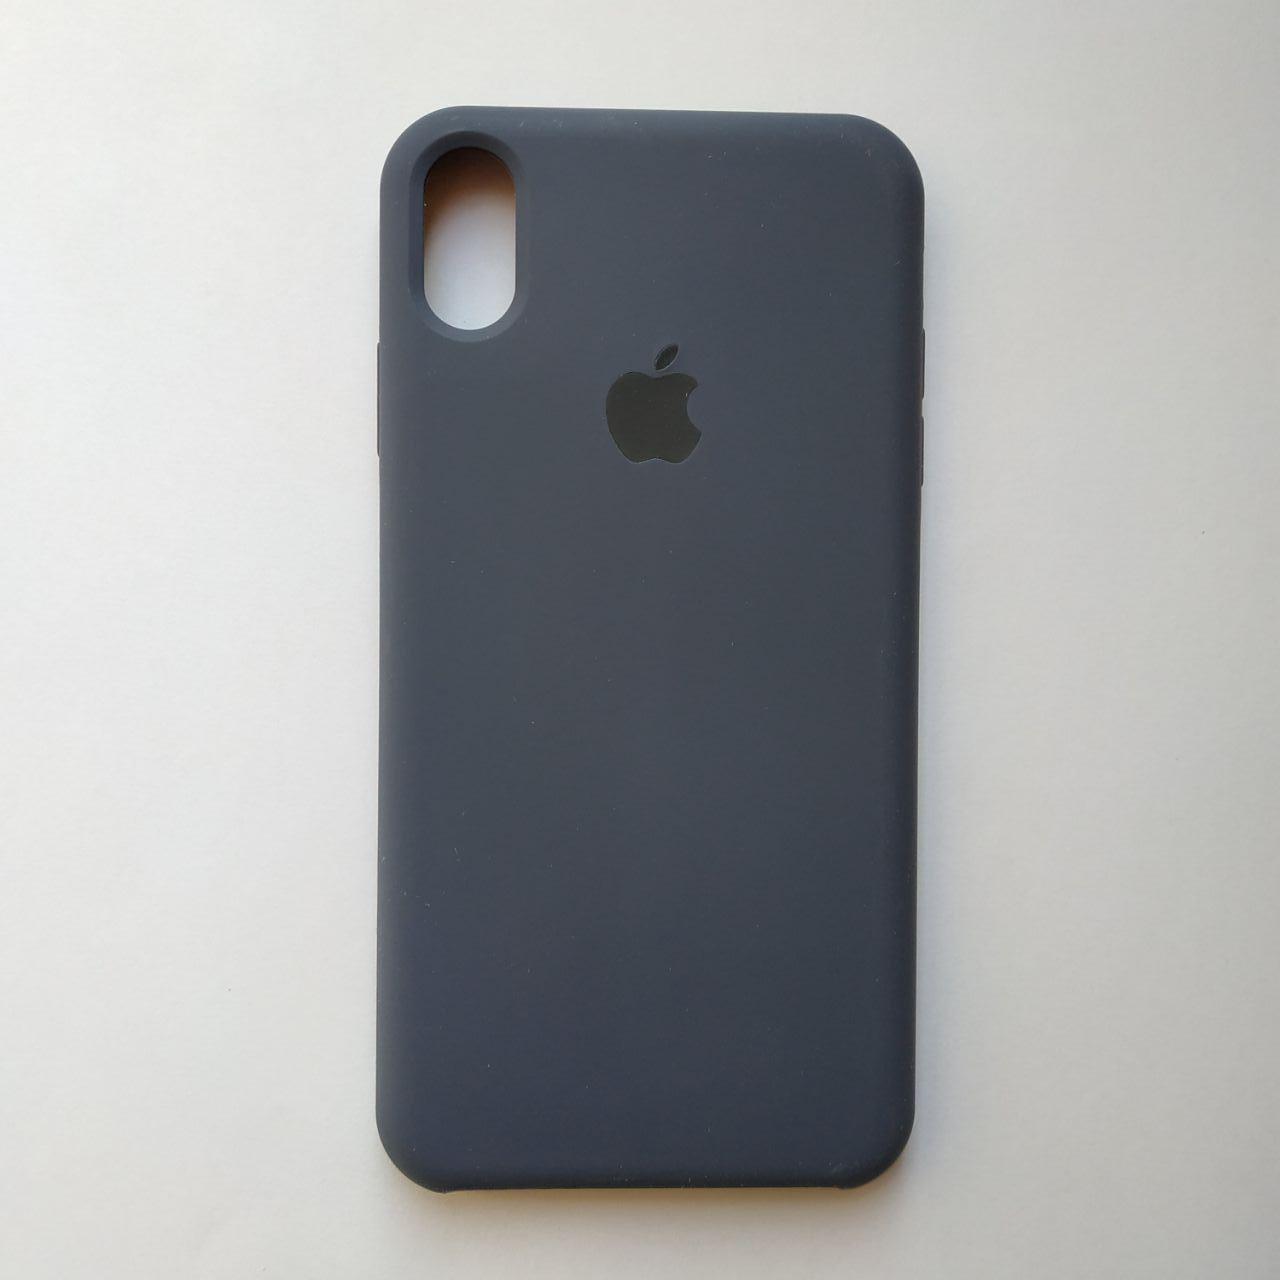 Чехол Silicone Case для Apple iPhone XS Max Midnight Blue